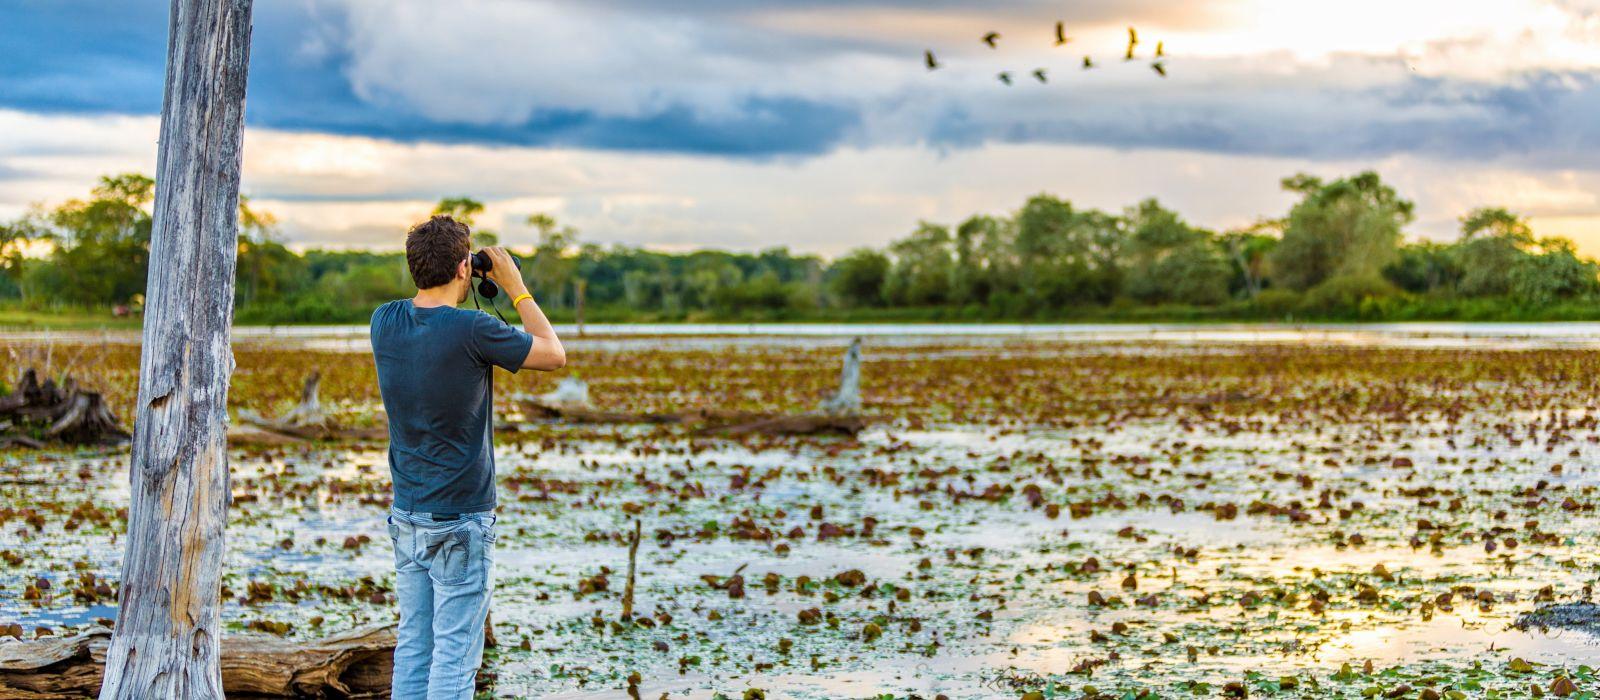 Brasilien Naturreise: Wasserfälle, Pantanal und Amazonas Urlaub 4